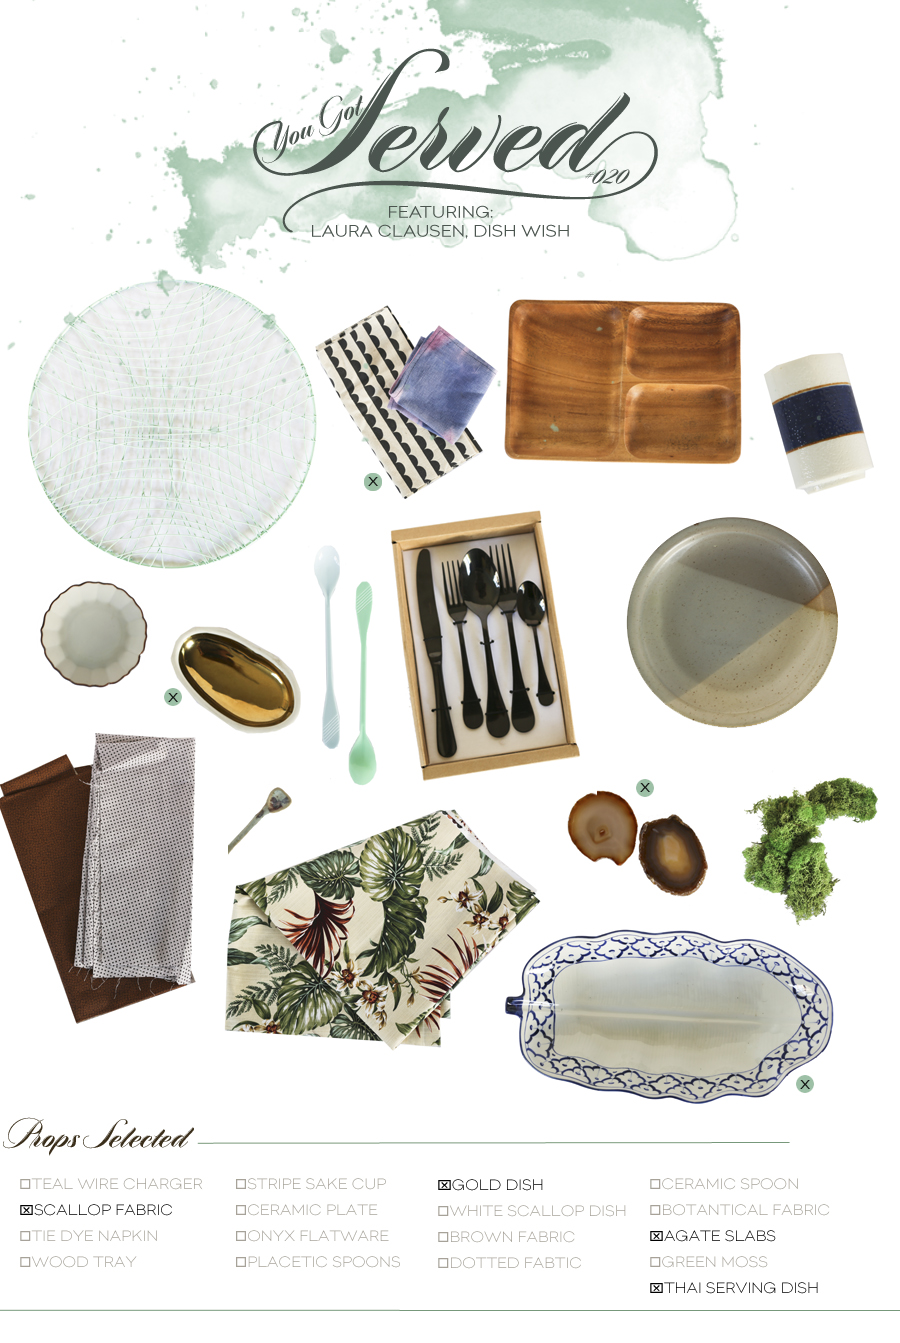 Dine X Design | You Got Served Dish Wish | Box 007 | Dine X Design